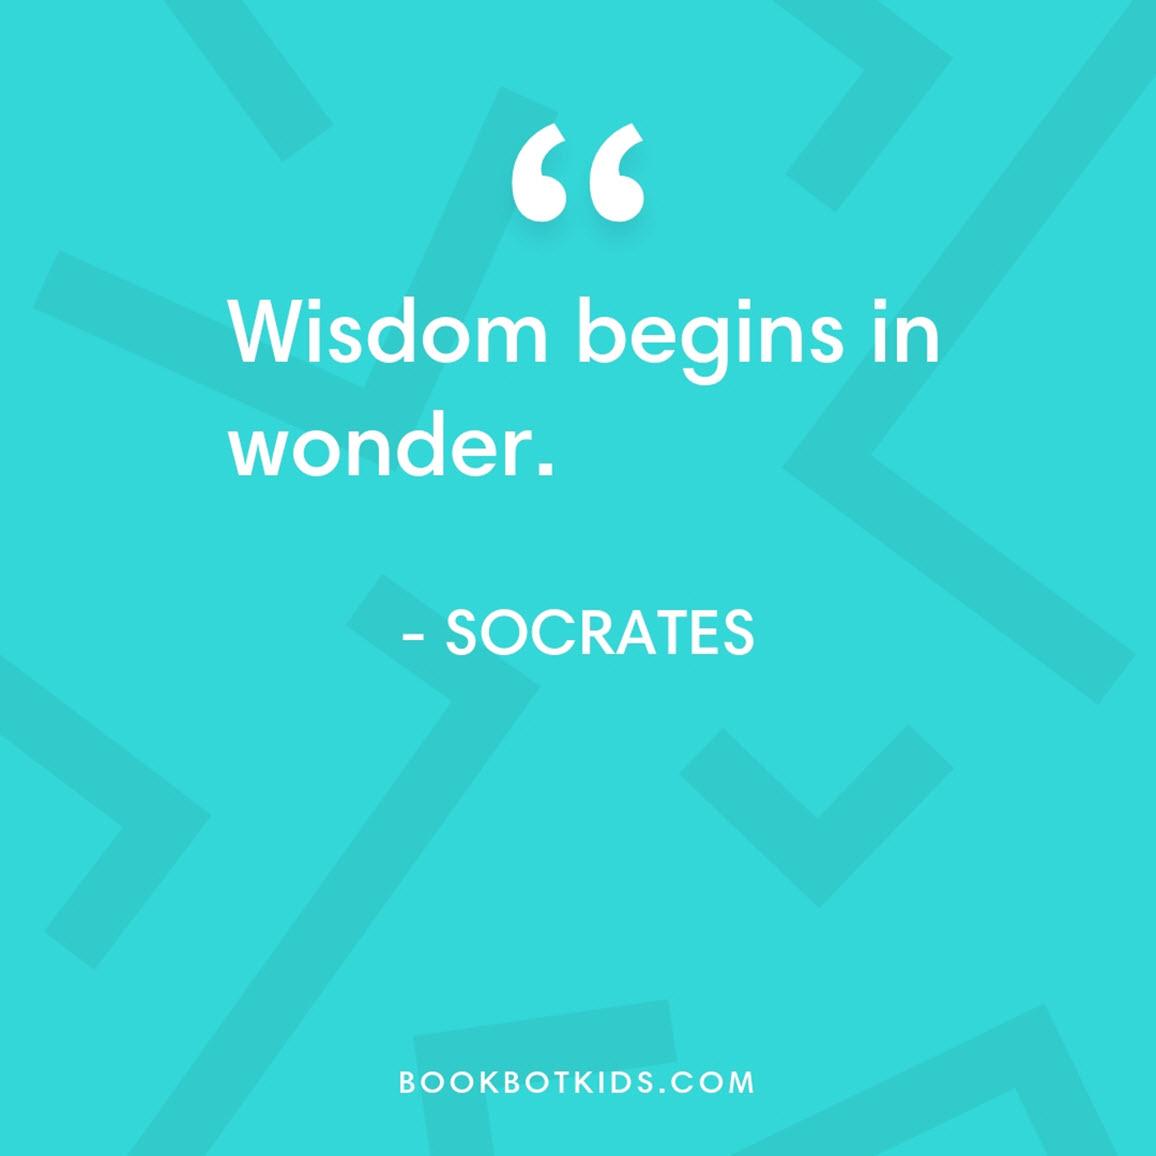 Wisdom begins in wonder. – Socrates